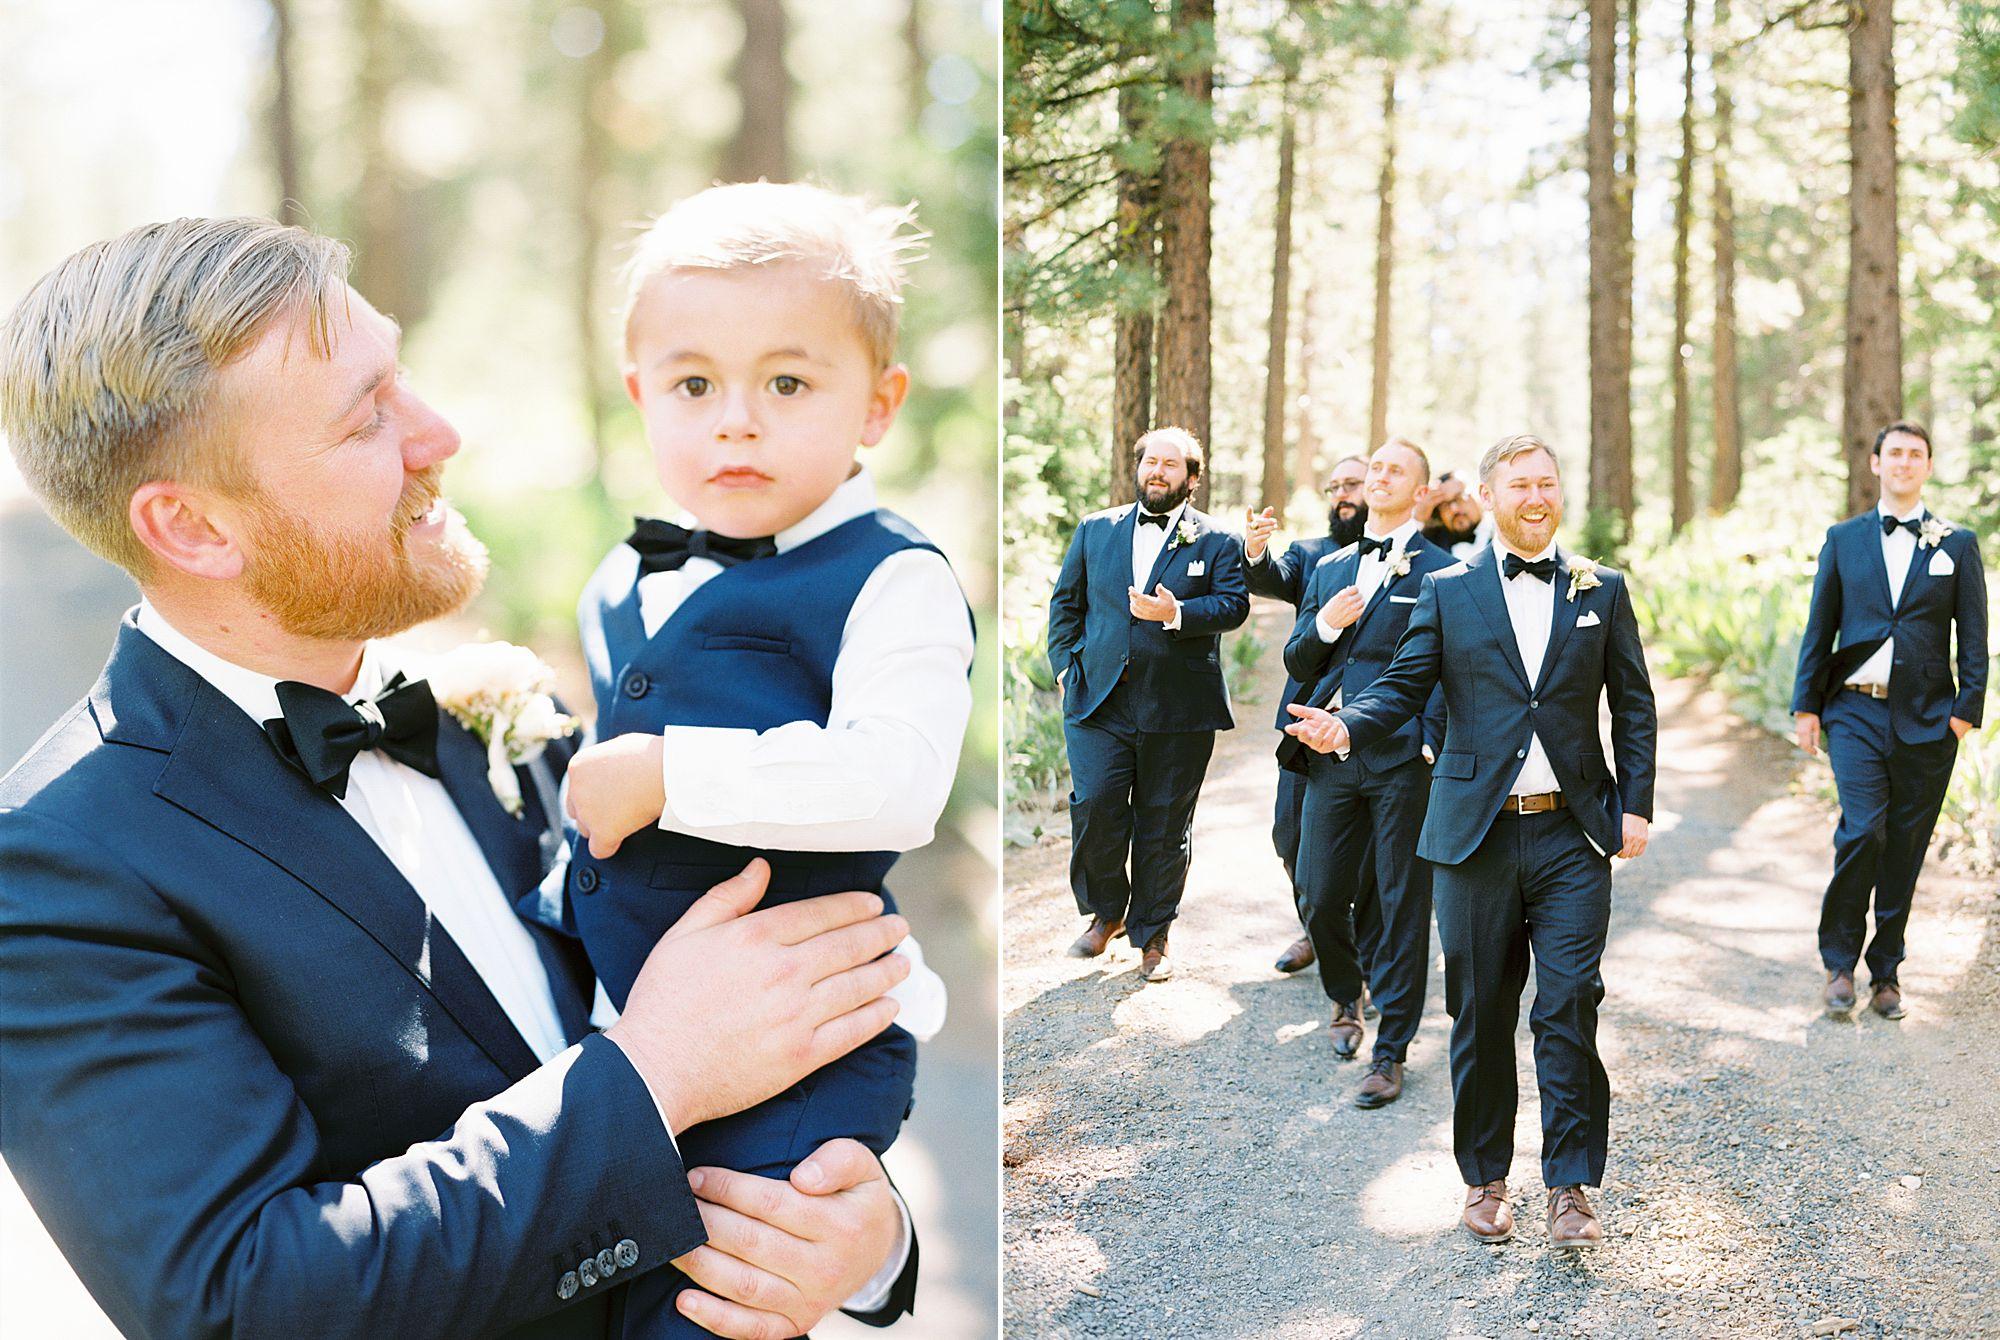 MITCHELLS MOUNTAIN MEADOWS Wedding - Ash Baumgartner - Phallina and Matt - Sierraville Wedding - Tahoe Wedding Photography_0016.jpg